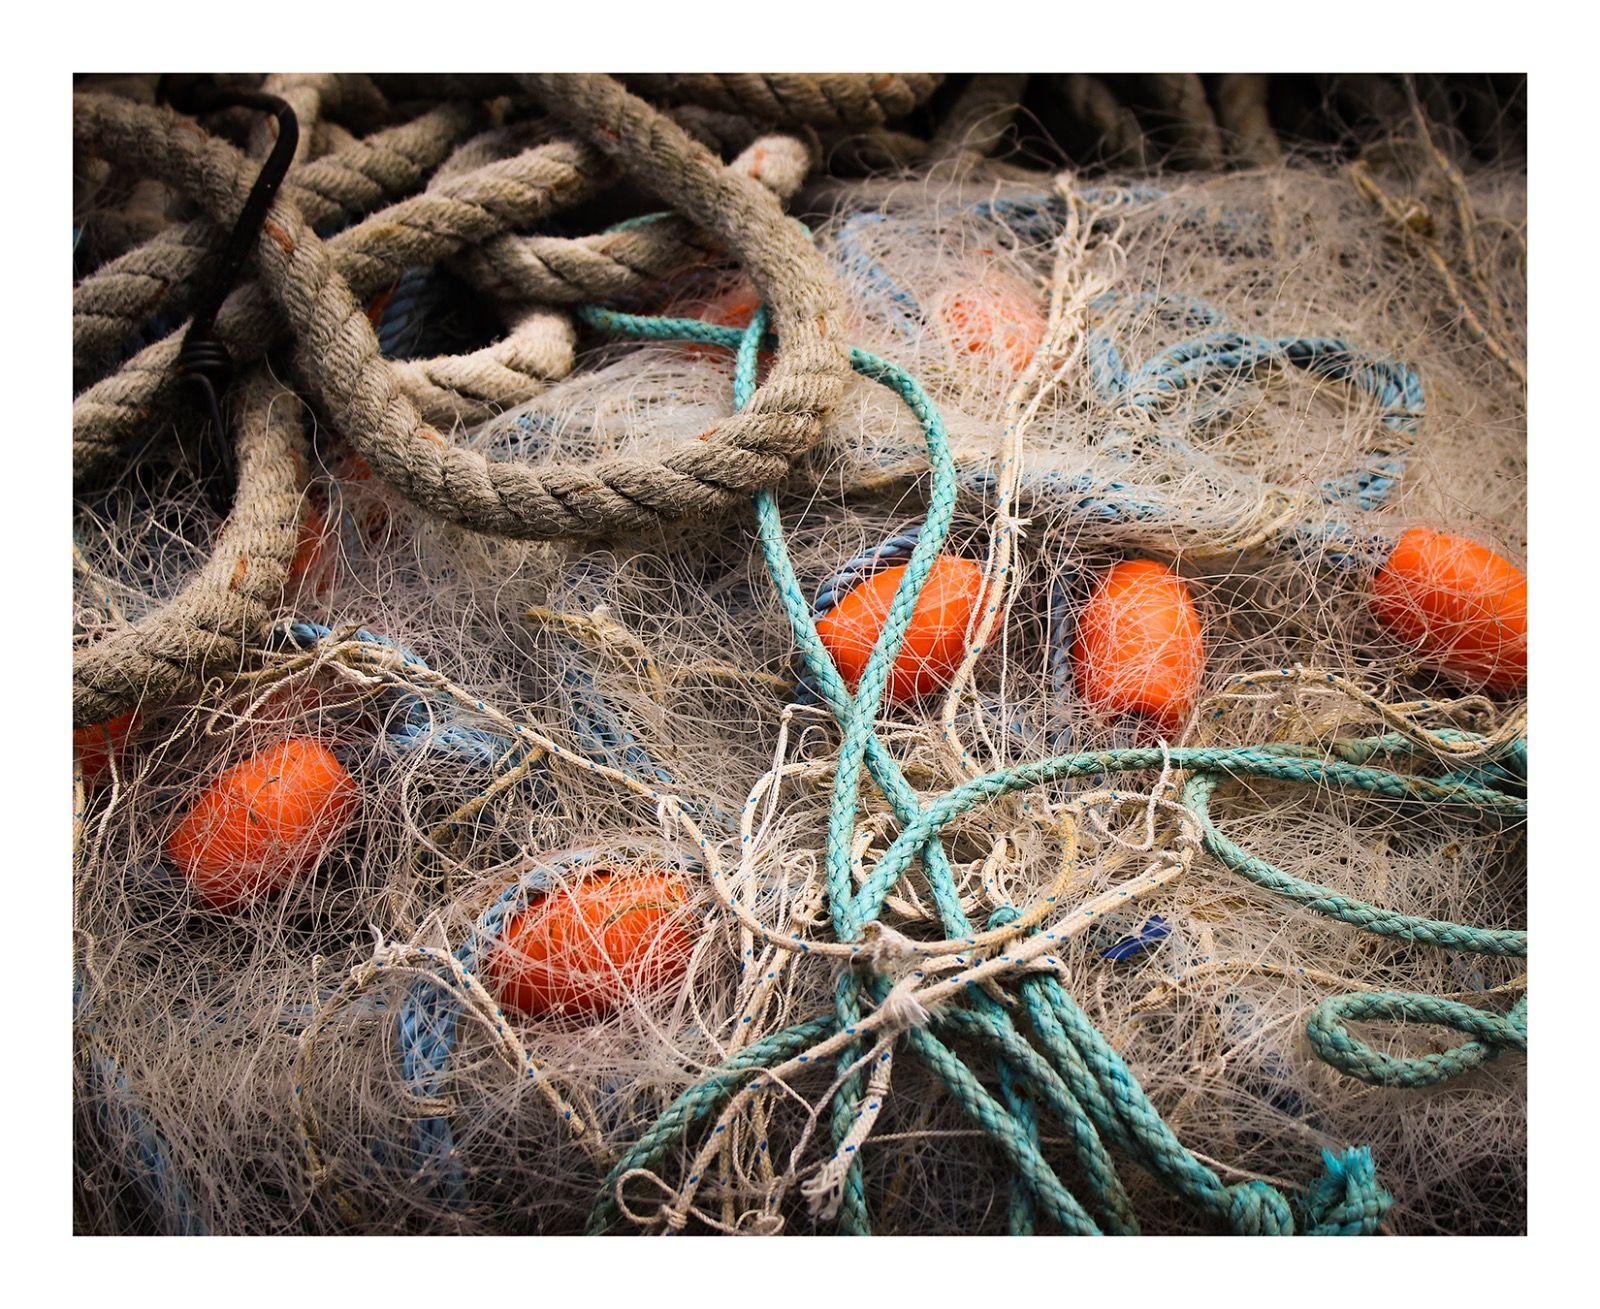 Fishing Nets, Sheringham